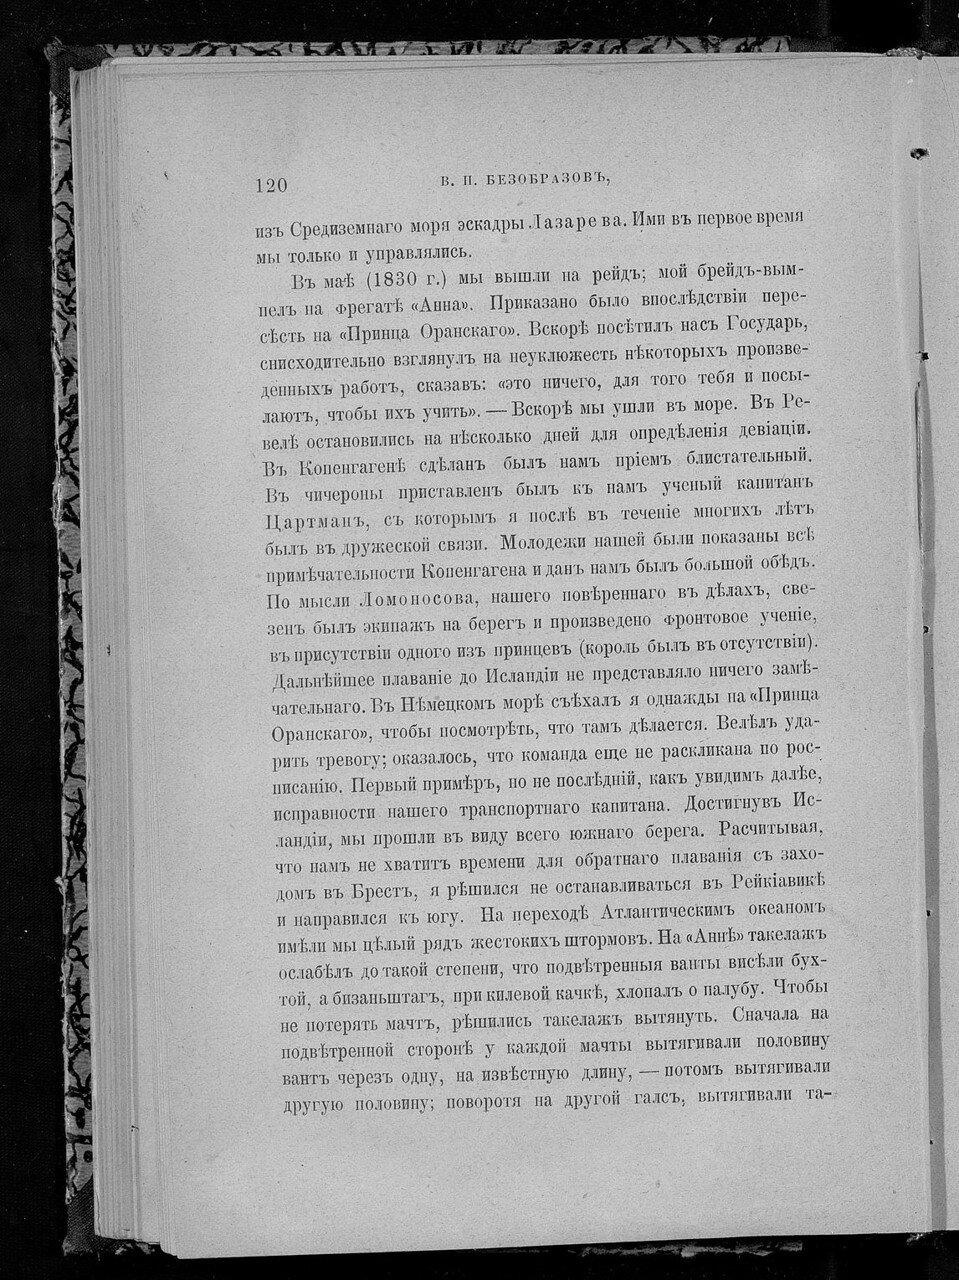 https://img-fotki.yandex.ru/get/879536/199368979.d5/0_21de17_a9985eb4_XXXL.jpg